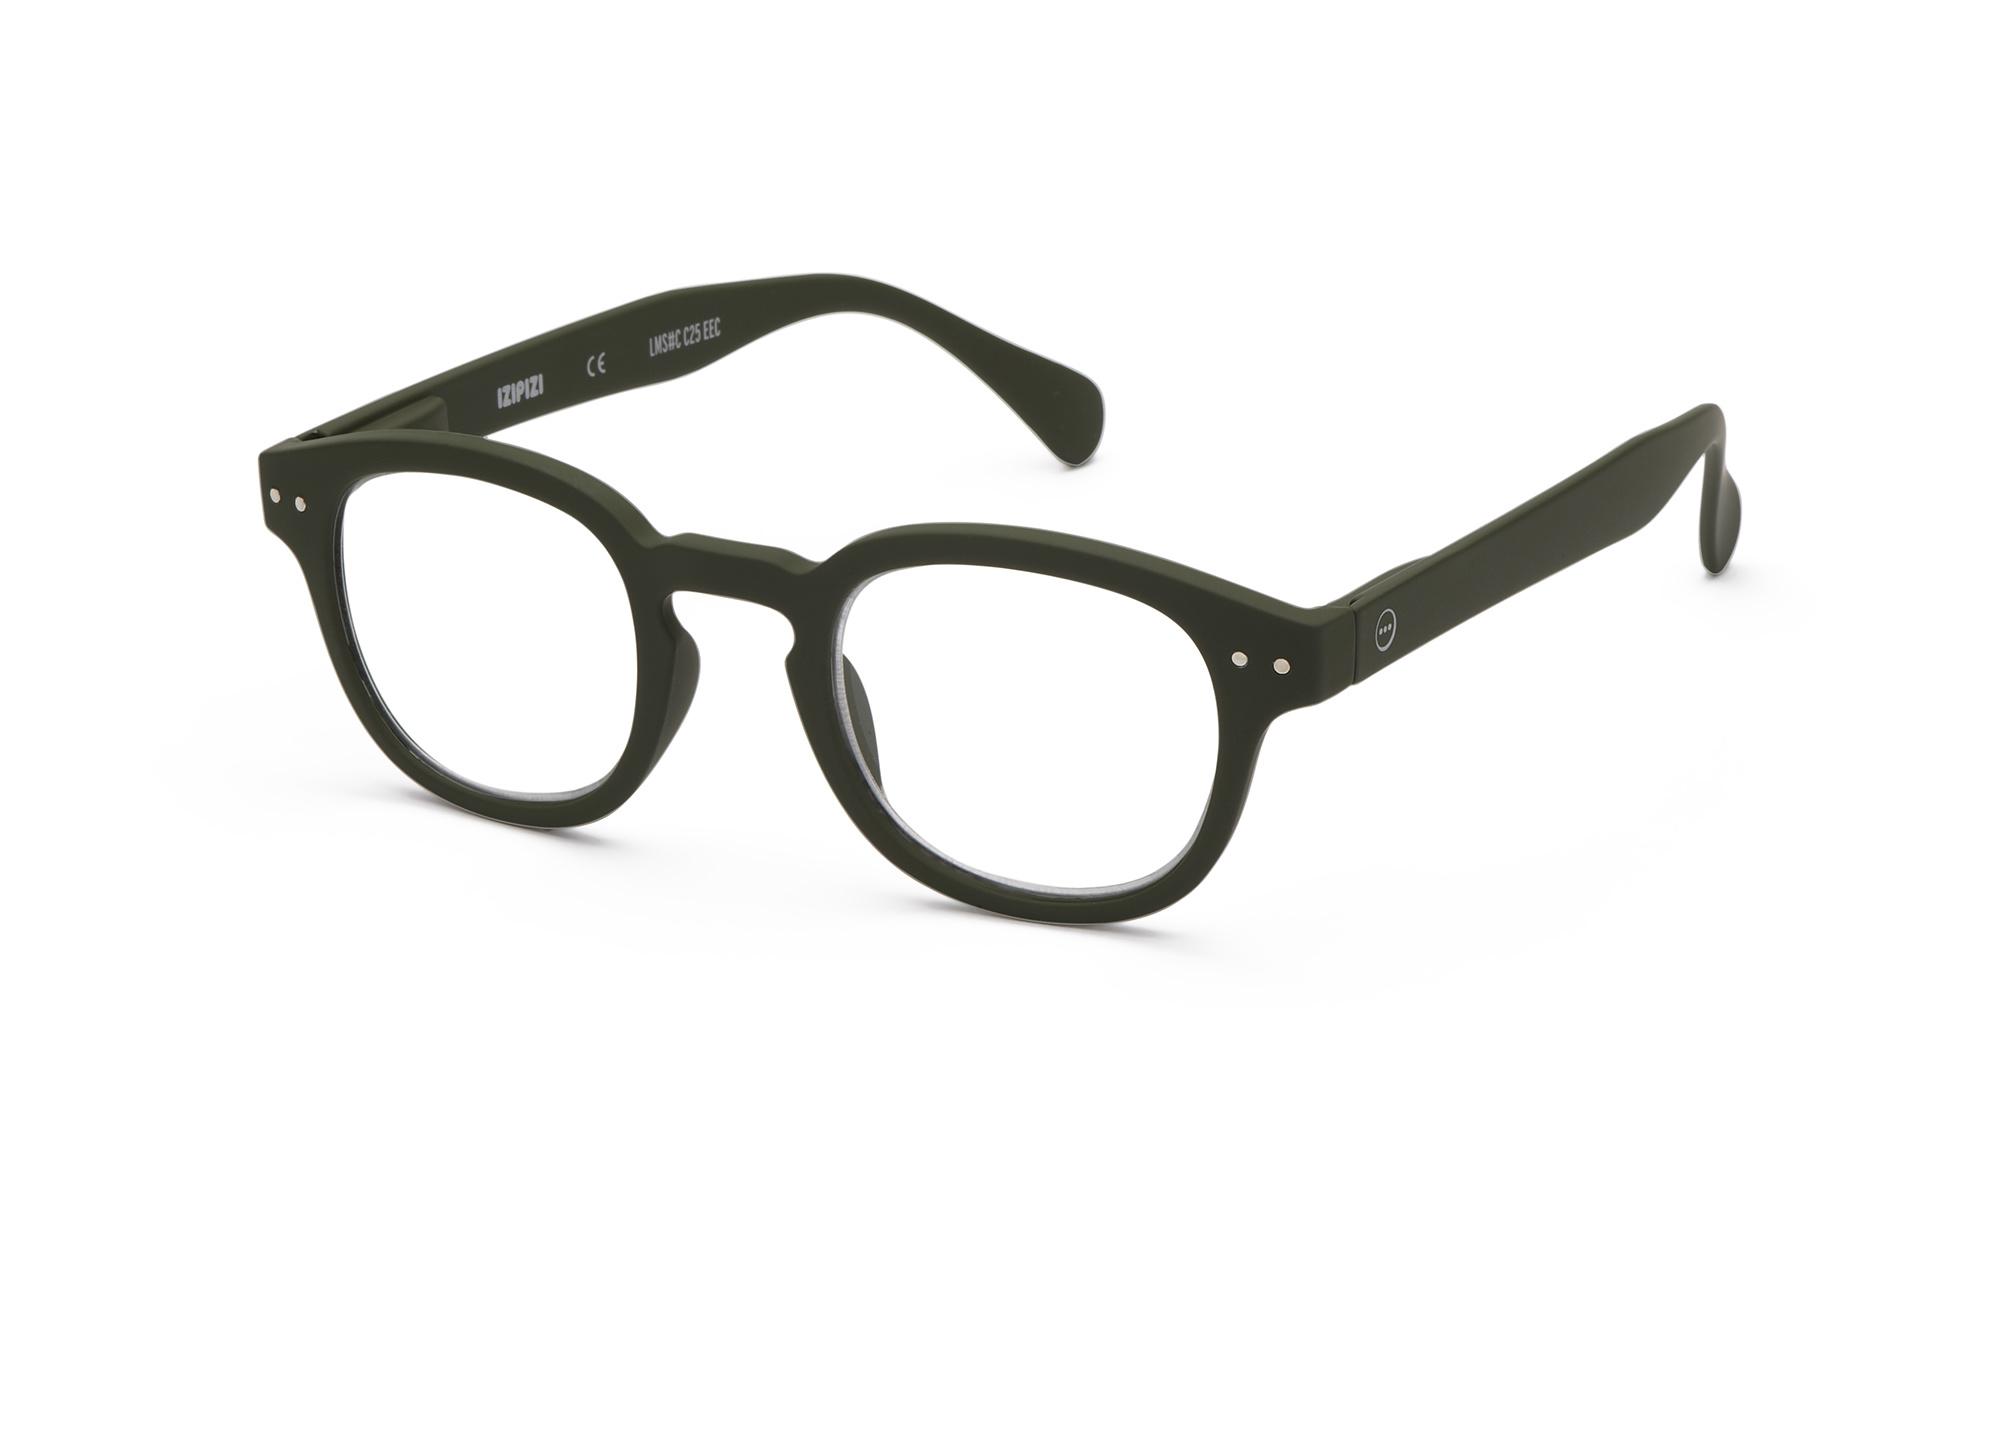 Izipizi leesbril model C Kaki Green-3